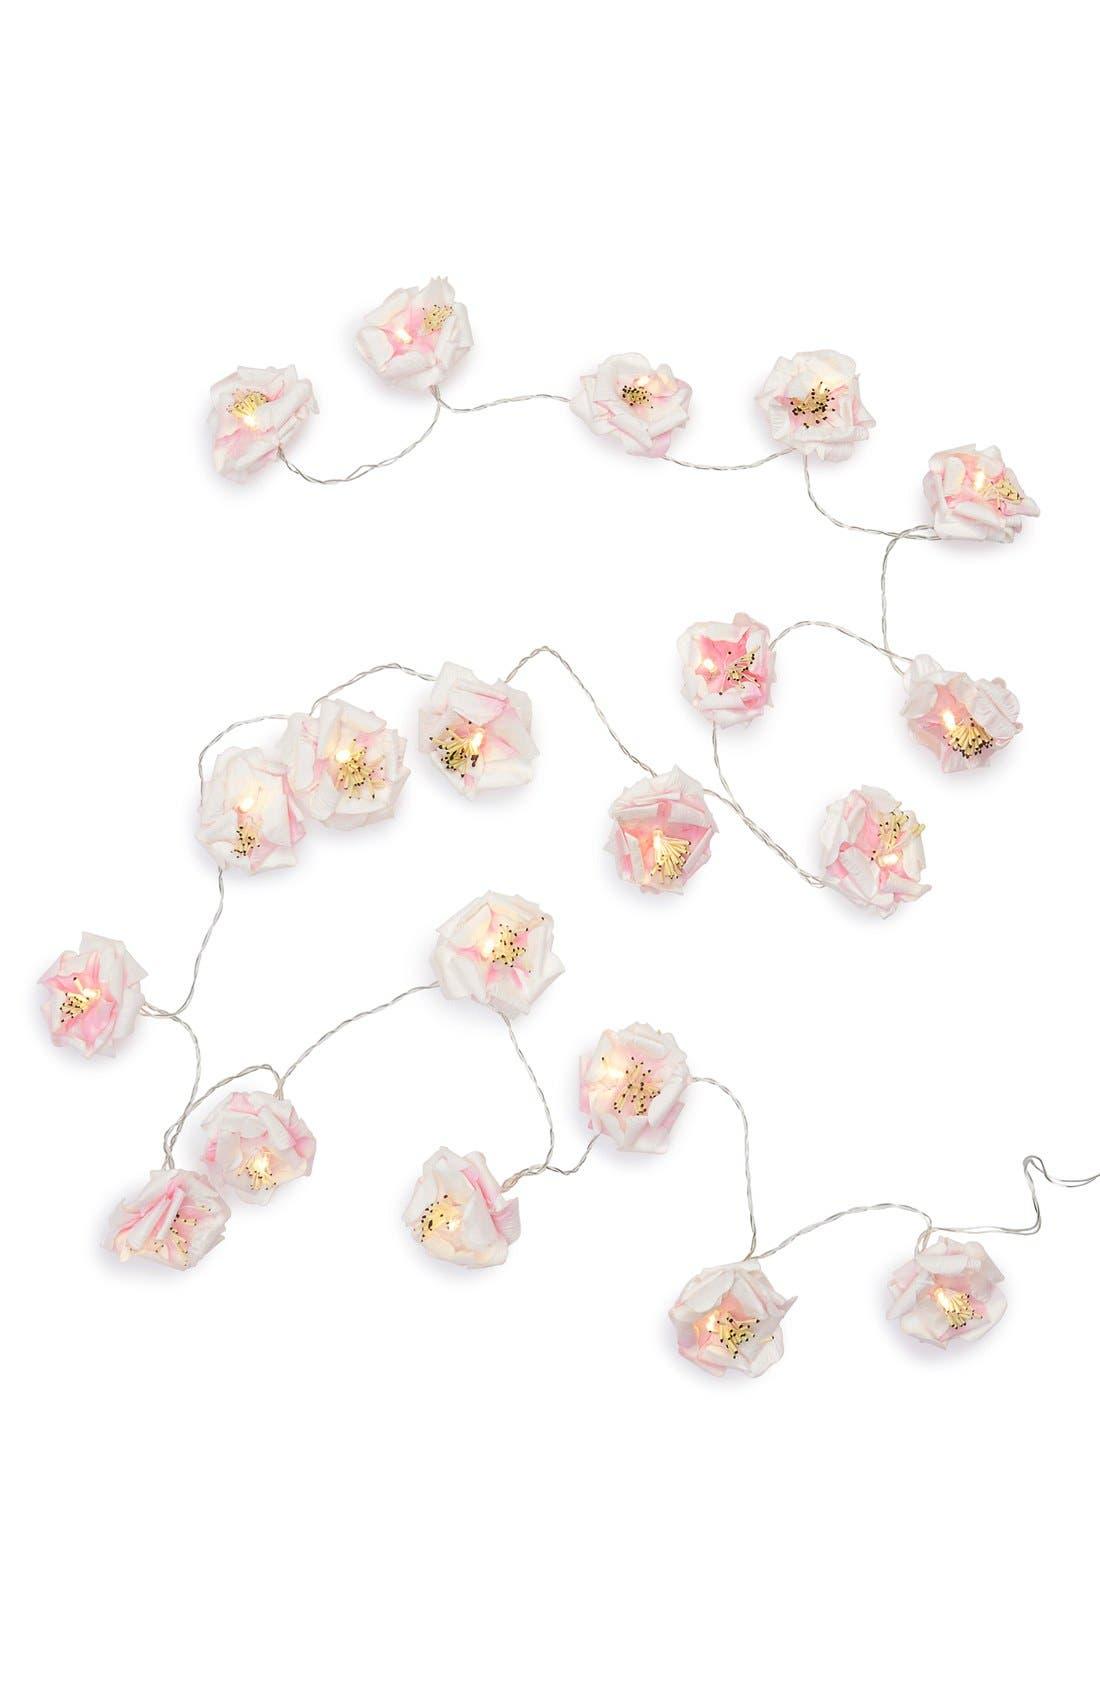 Alternate Image 1 Selected - Talking Tables 'Blossom' Light String